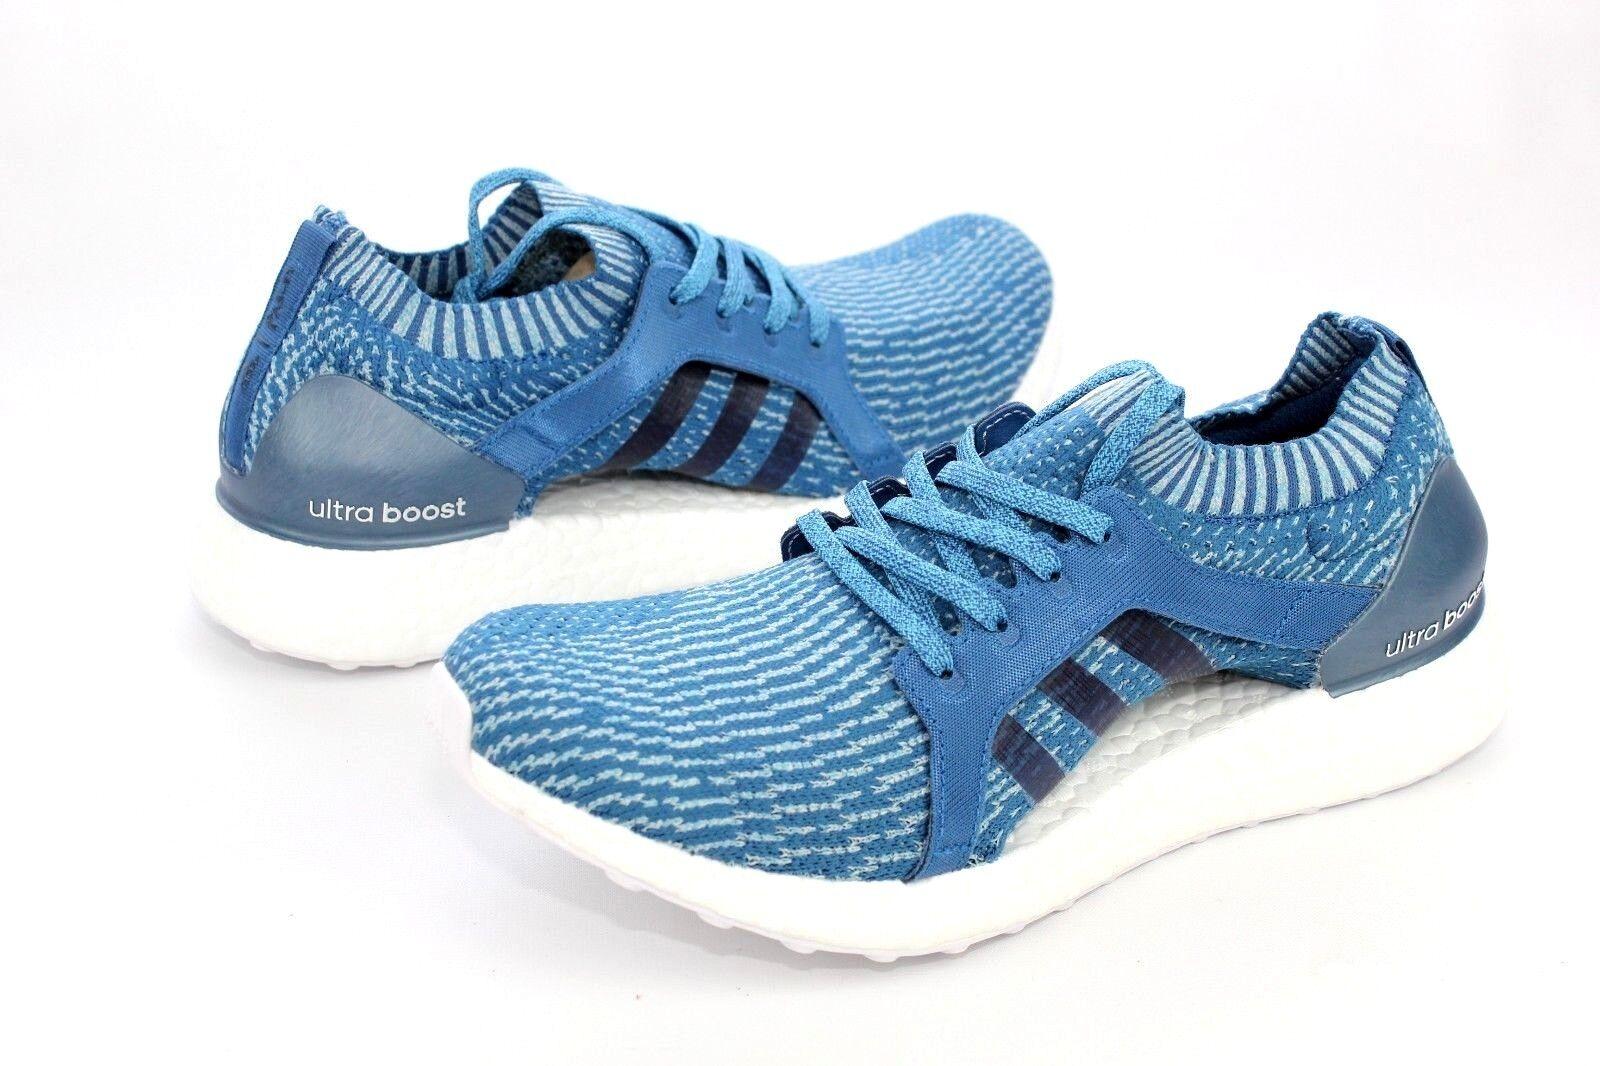 sports shoes 0a864 c9c4c Adidas Adidas Adidas Ultraboost X Parley Womens Running shoes bluee Size  9.5 US NIB BB1978 d0b446